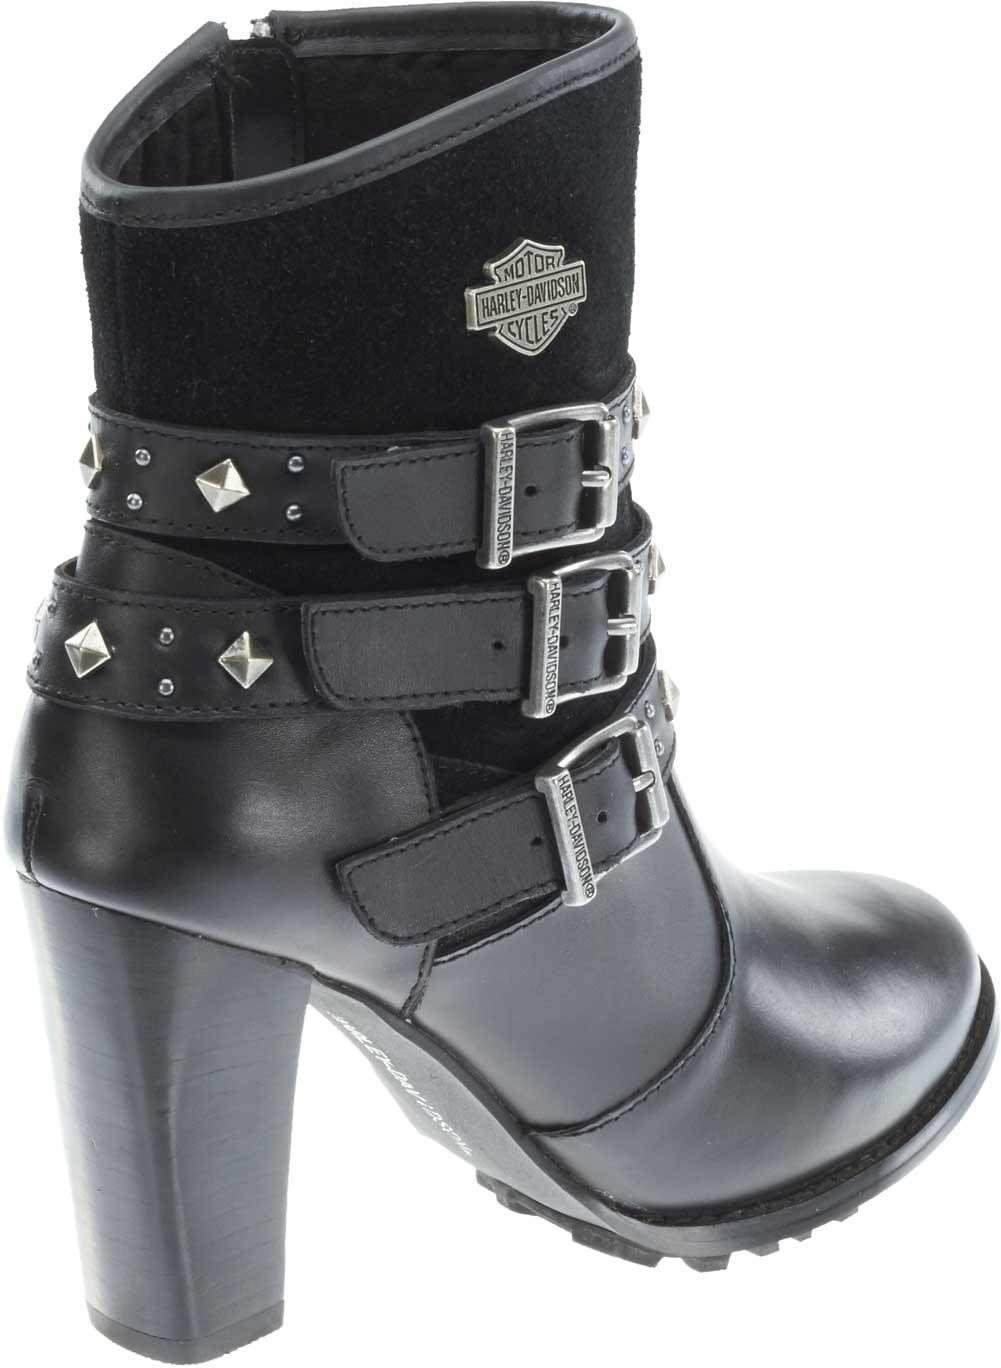 Abbaye Harley-davidson Boot (femmes) La Vente En Ligne Officielle Acheter Jeu Pas Cher tYN98HhfXC